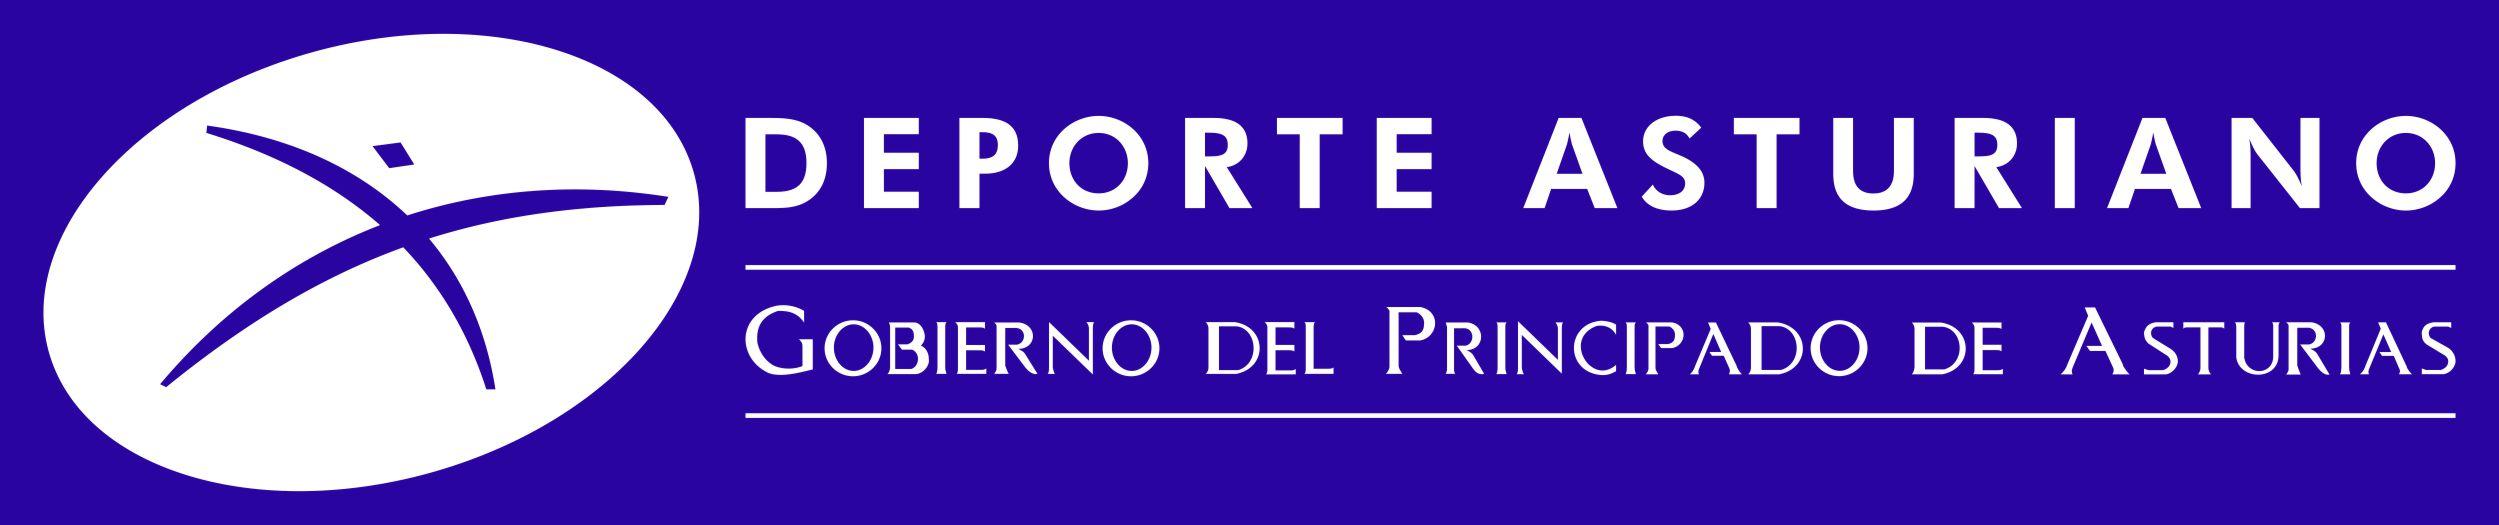 logotipo-deporte-asturiano